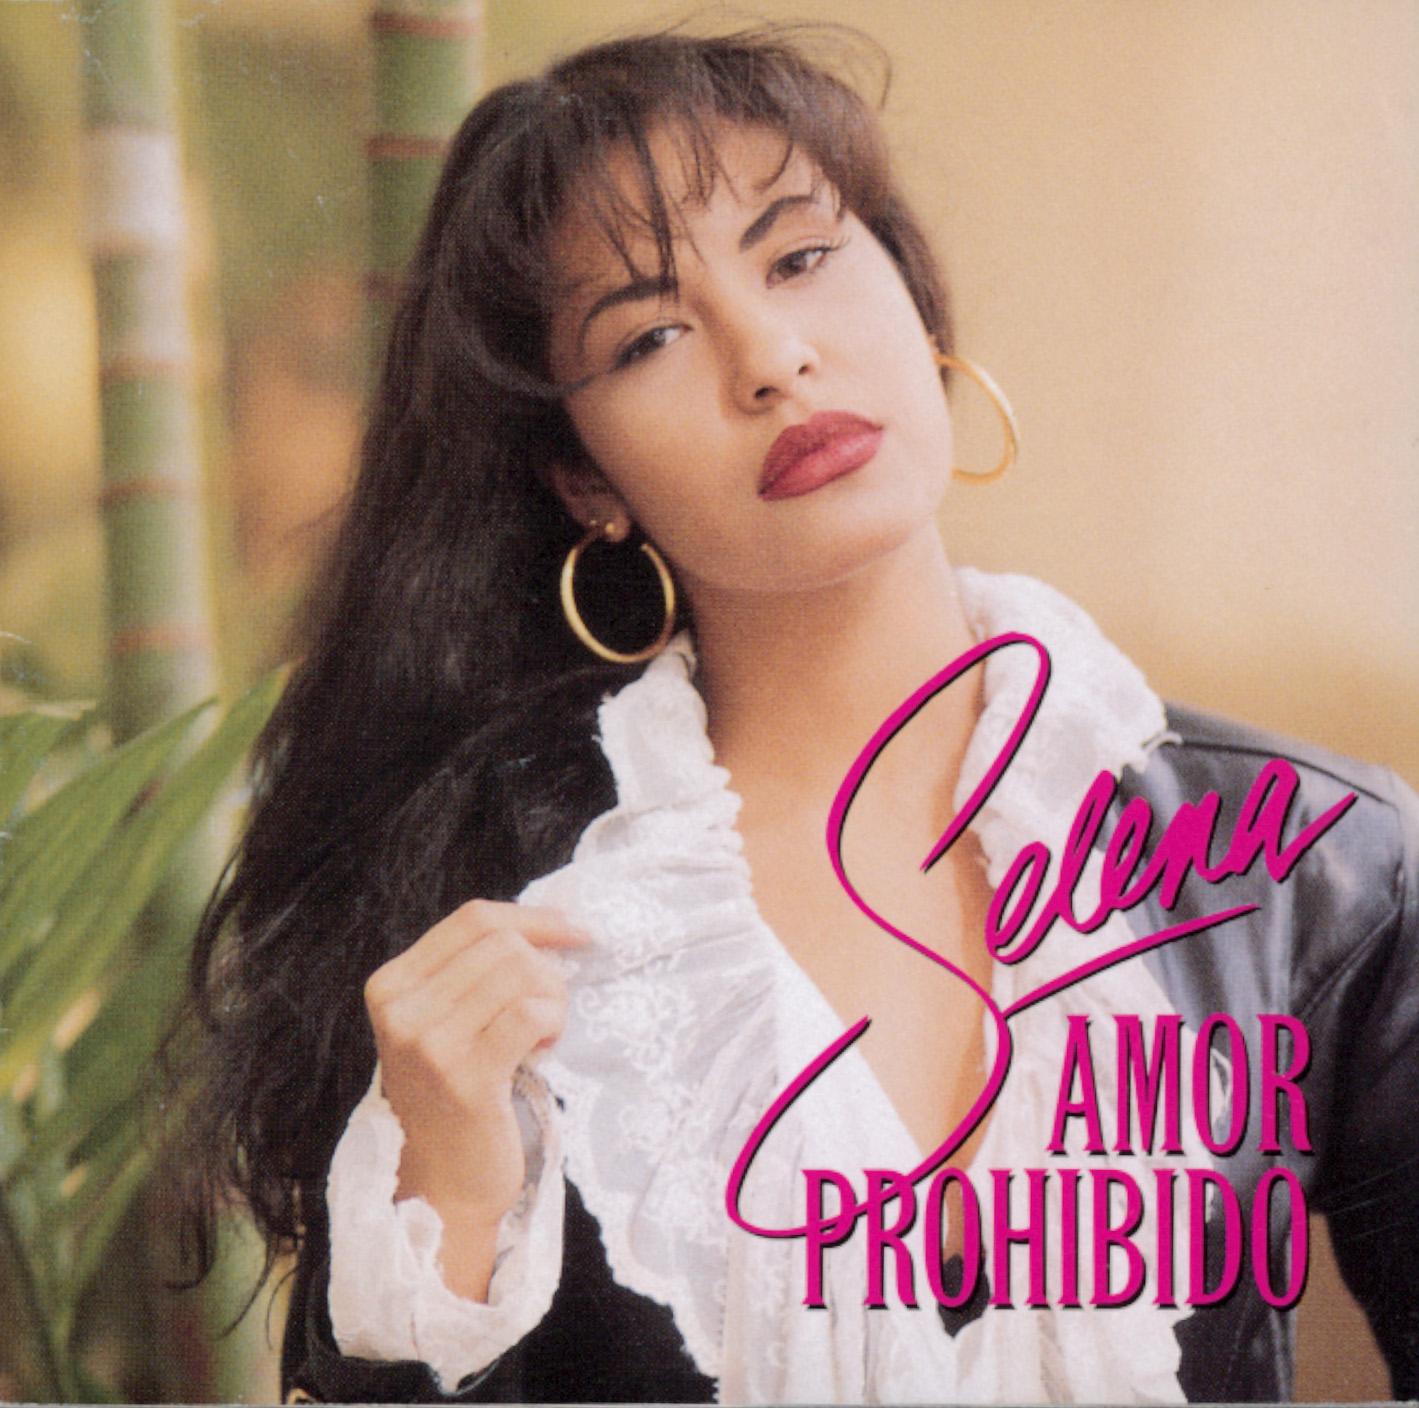 Rawimage Selena Amor Prohibido Photos Of